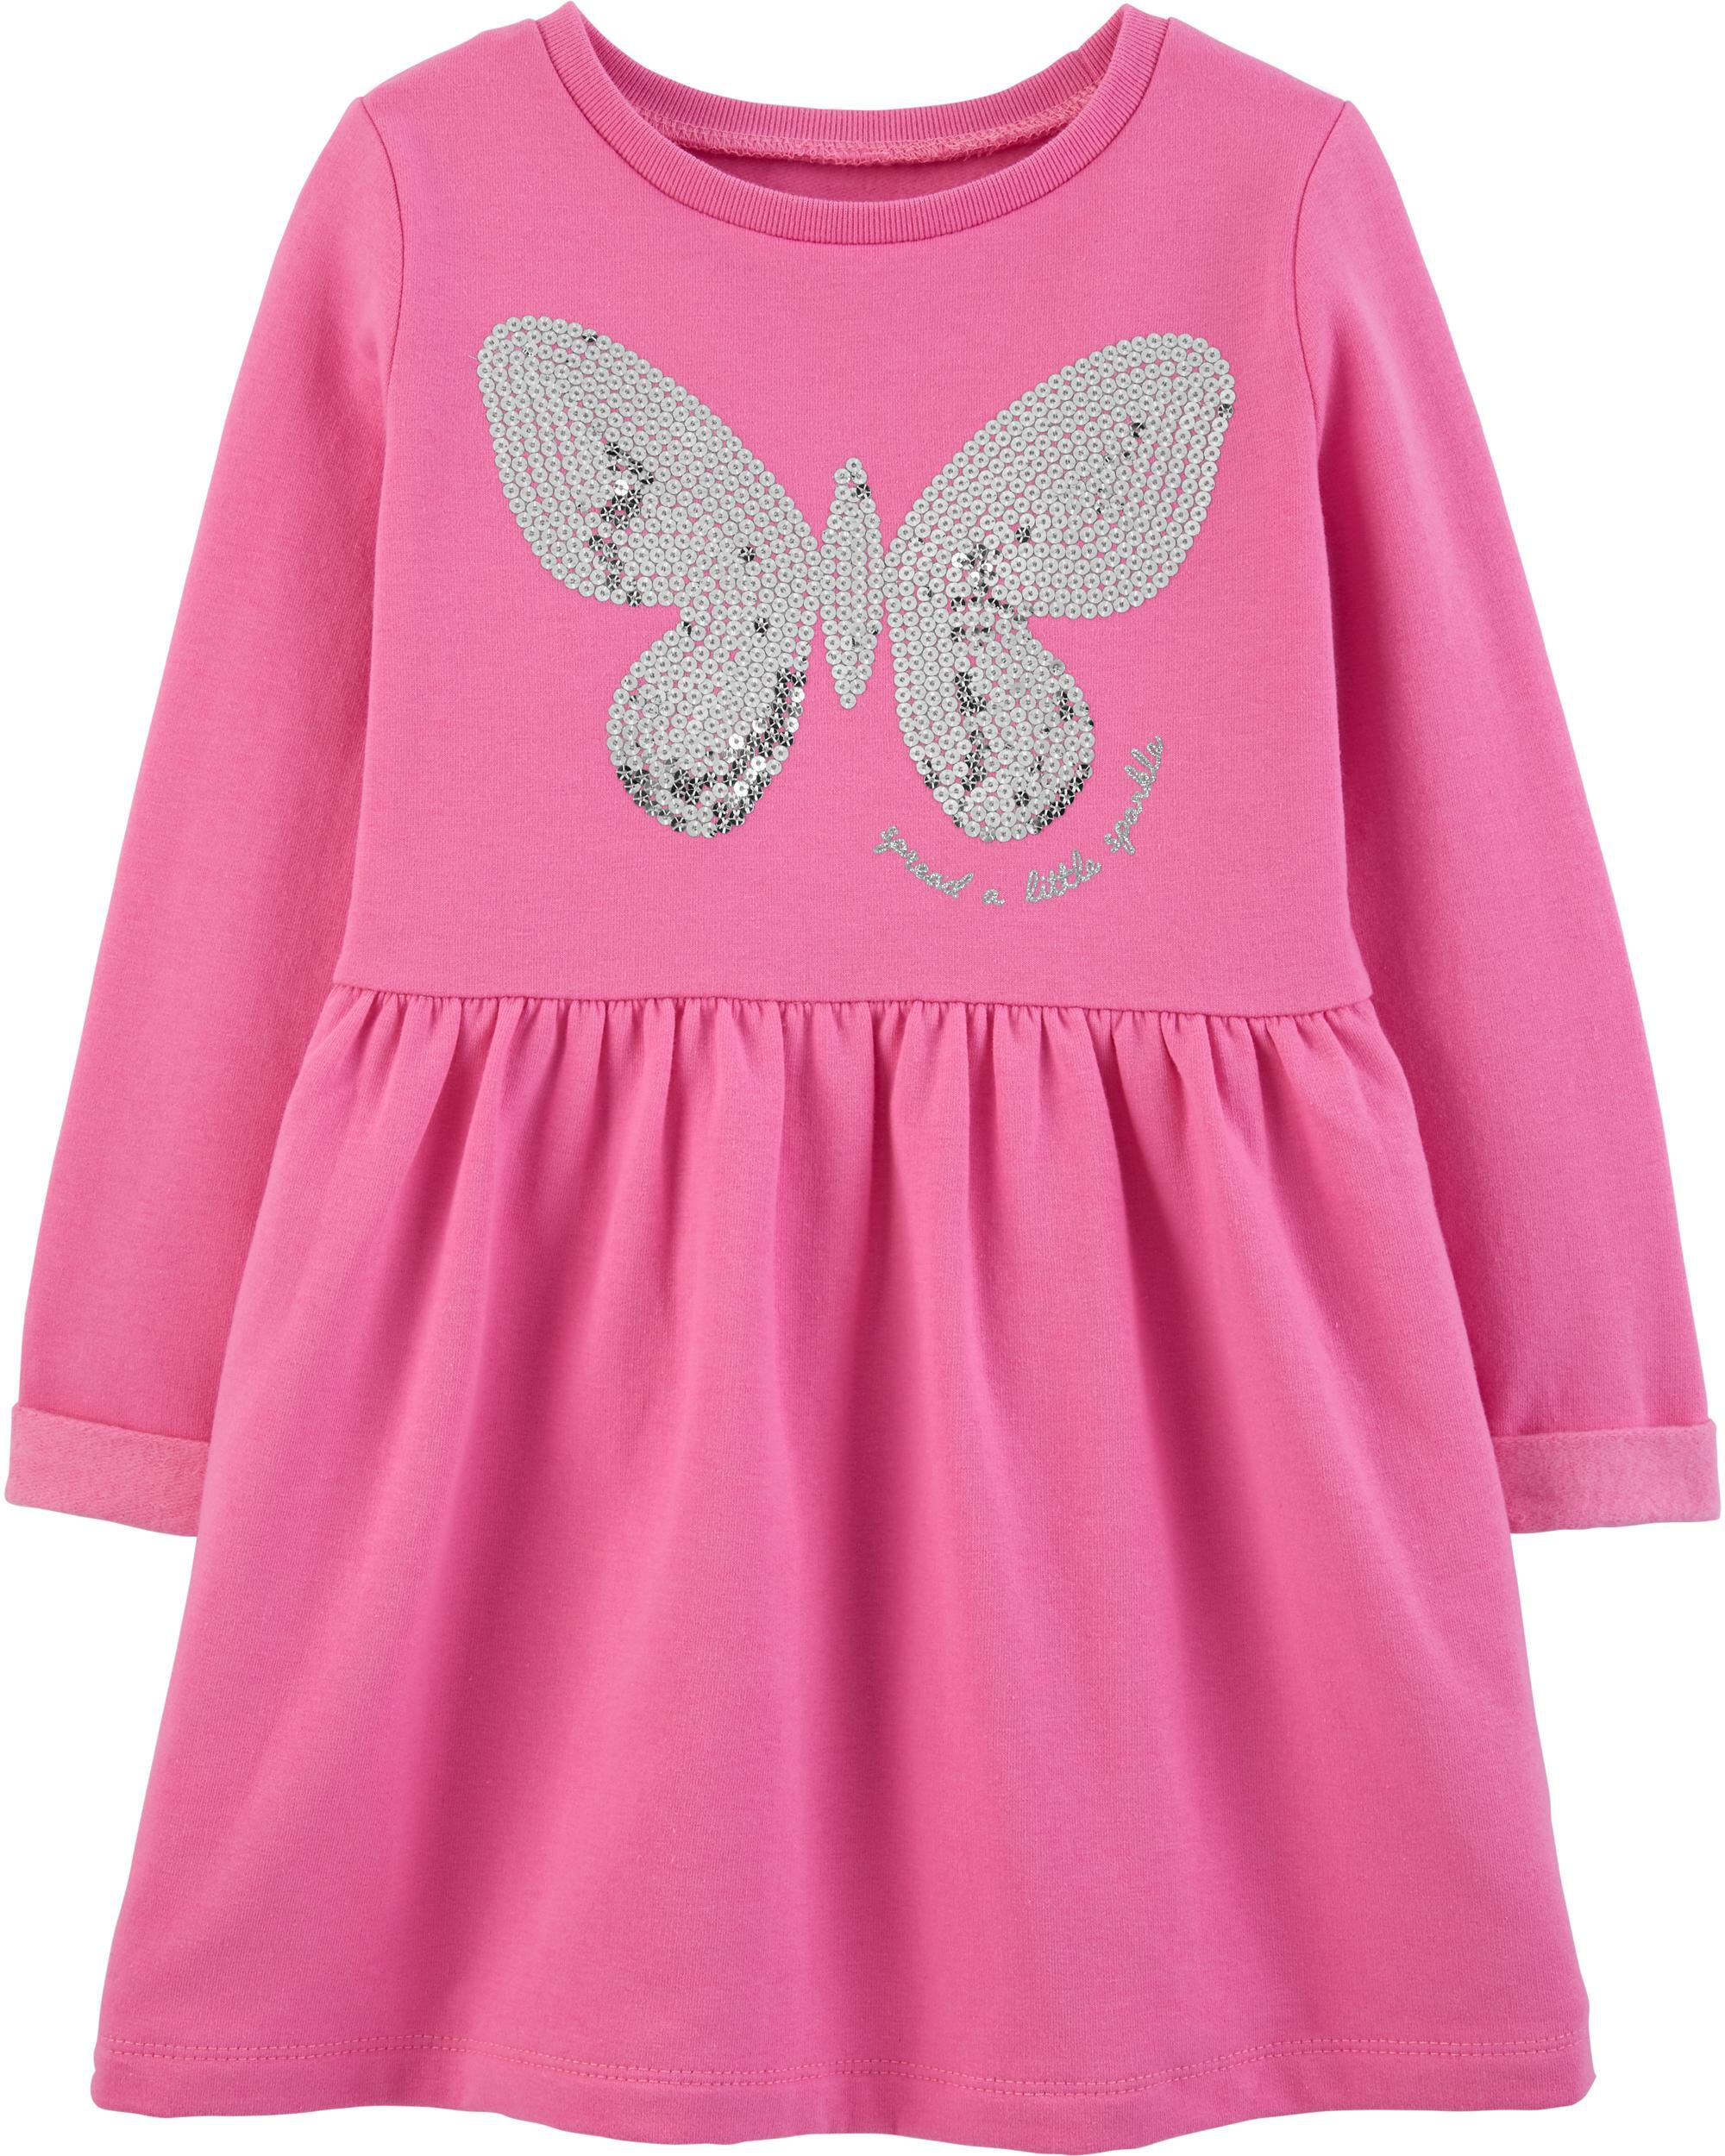 *Clearance*  Sequin Butterfly Fleece Dress